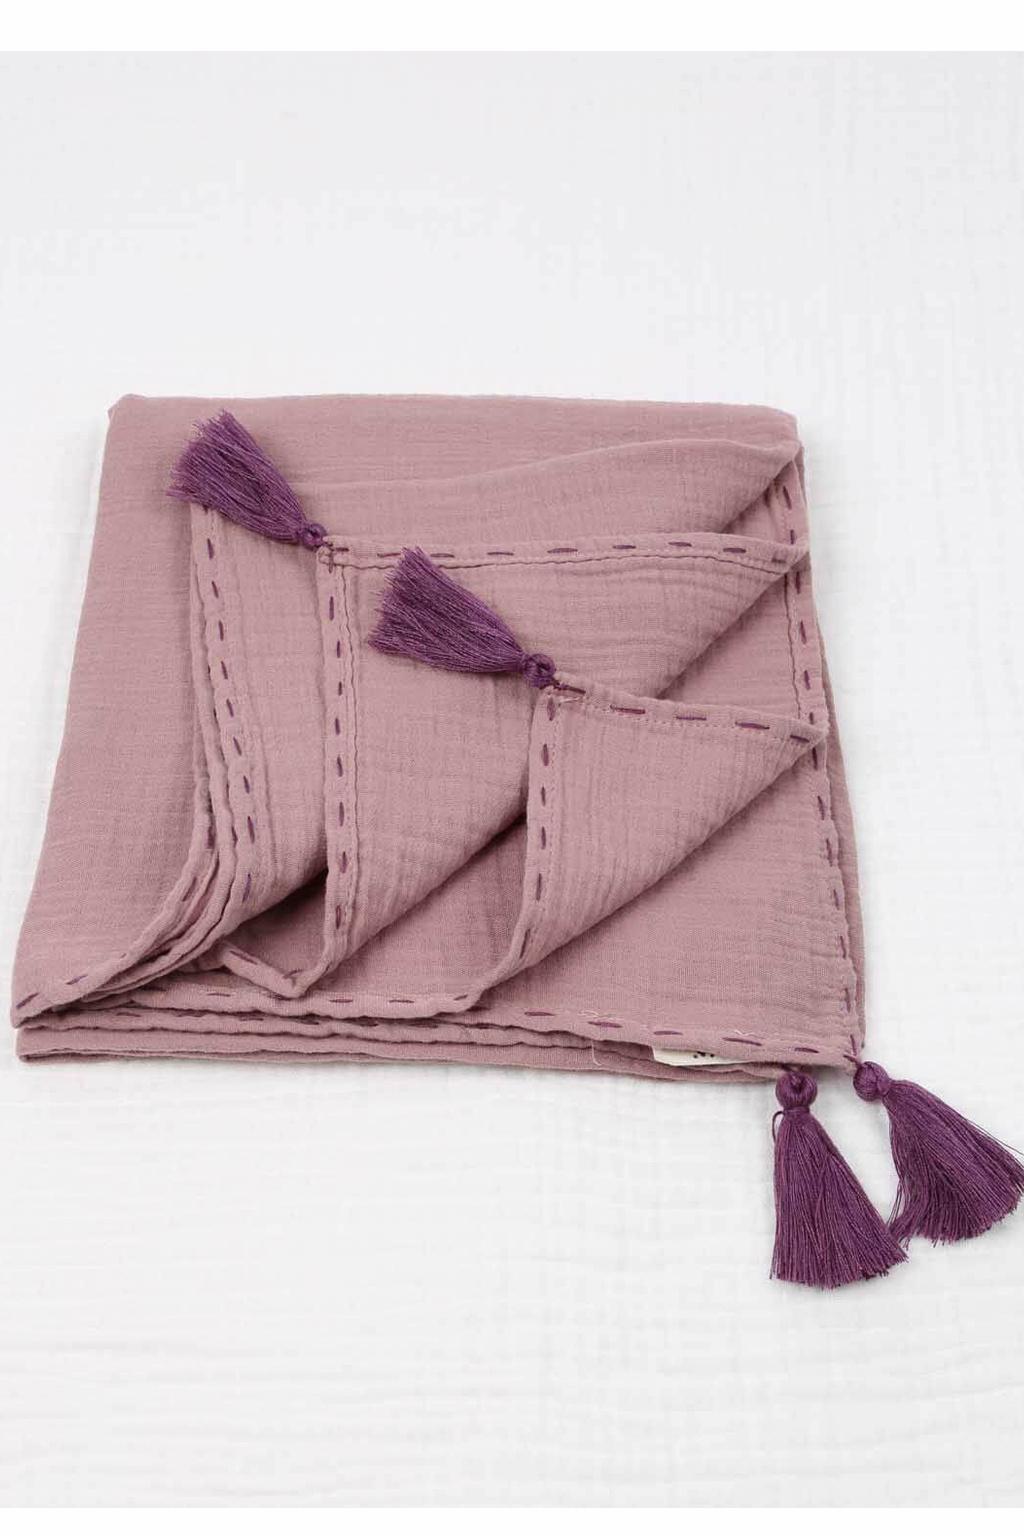 Mušelínová zavinovací deka 100x100 cm růžovofialová